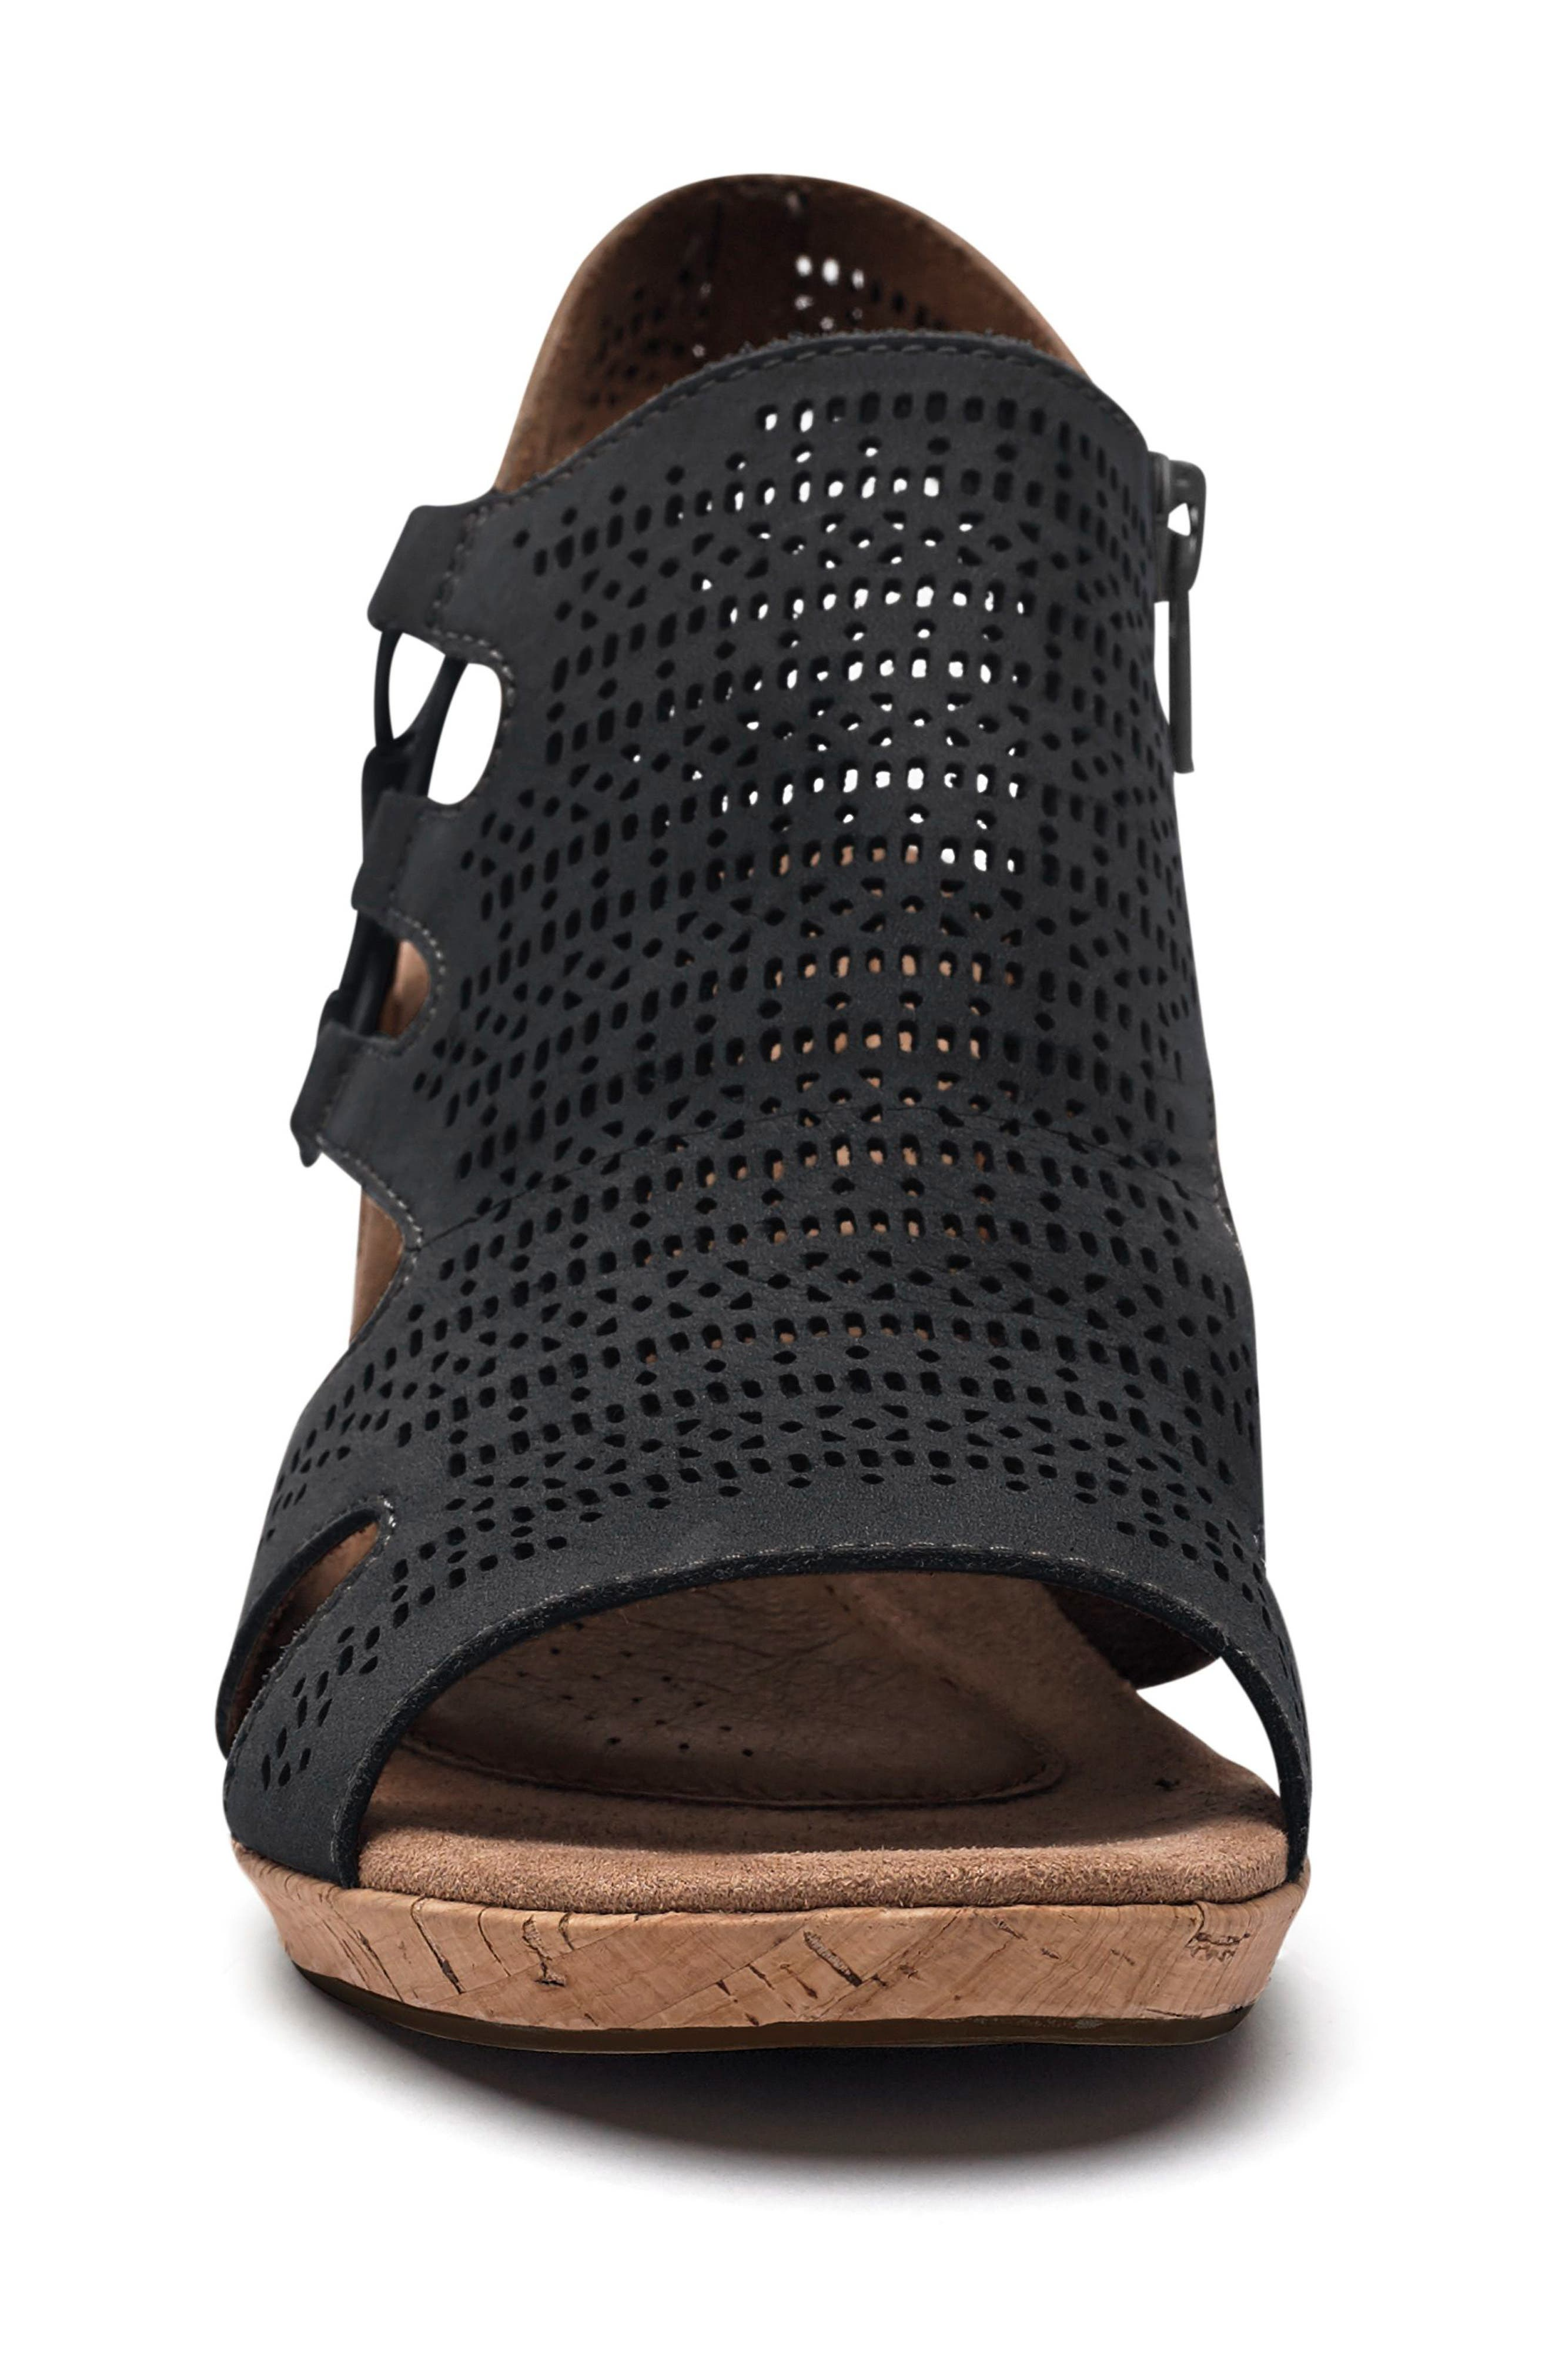 Janna Perforated Wedge Sandal,                             Alternate thumbnail 4, color,                             BLACK NUBUCK LEATHER